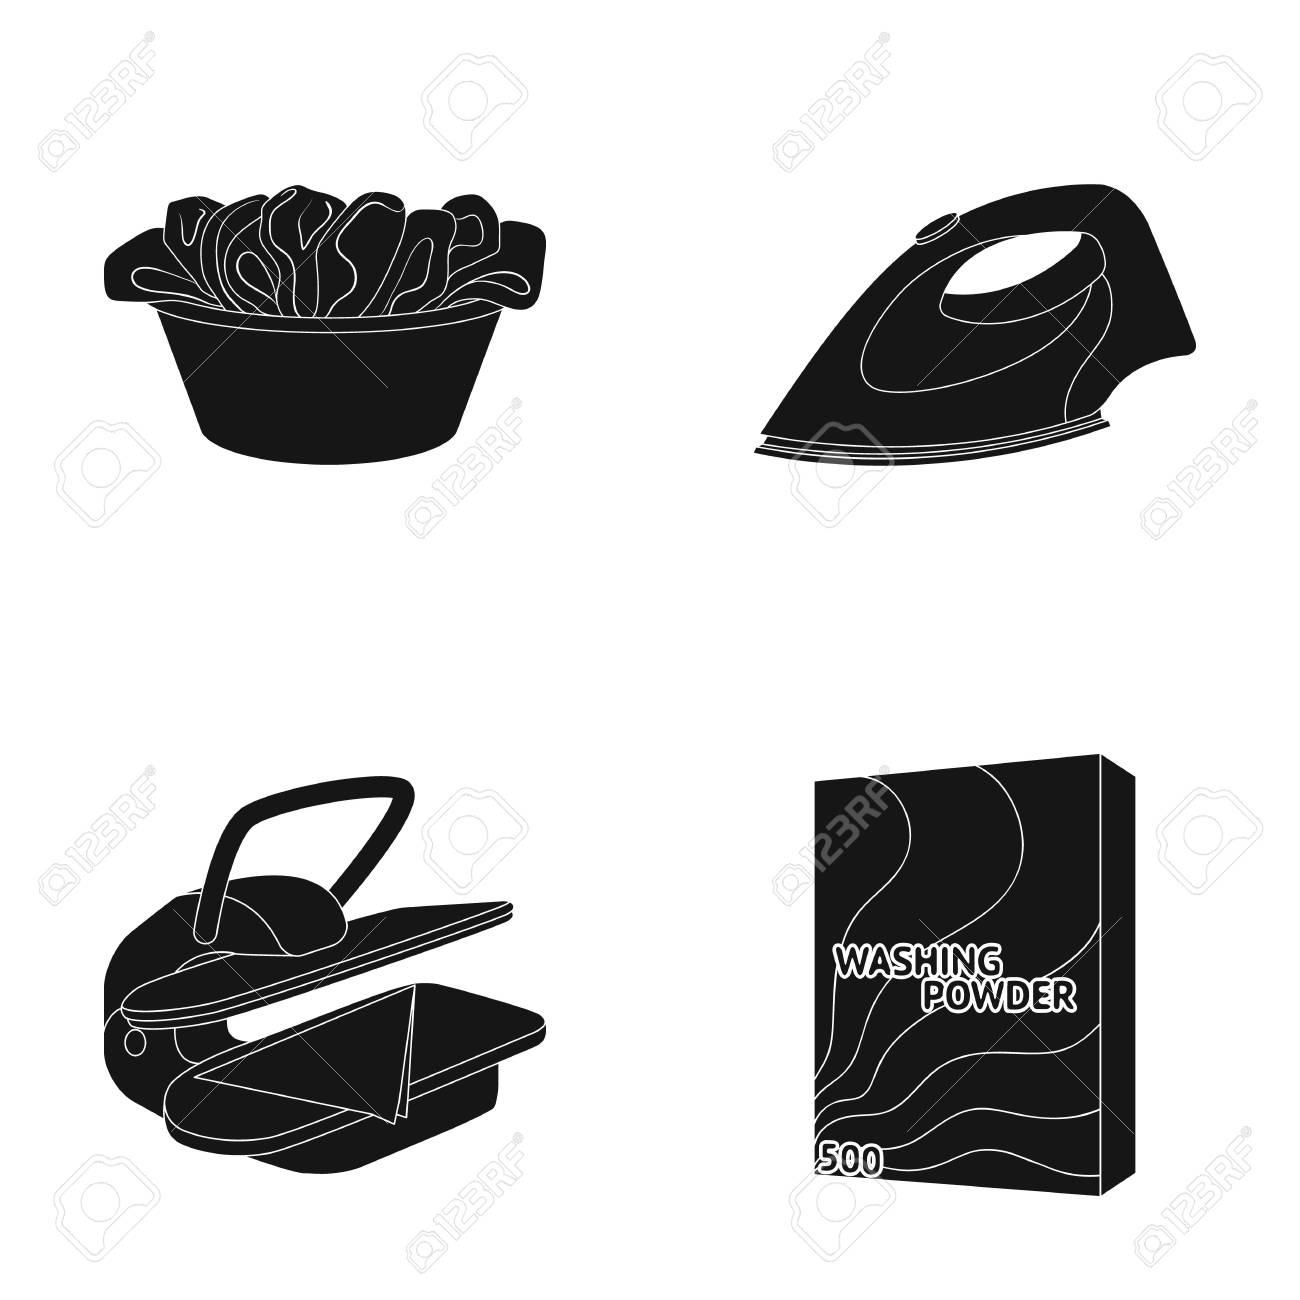 A bowl with laundry, iron, ironing press, washing powder  Dry